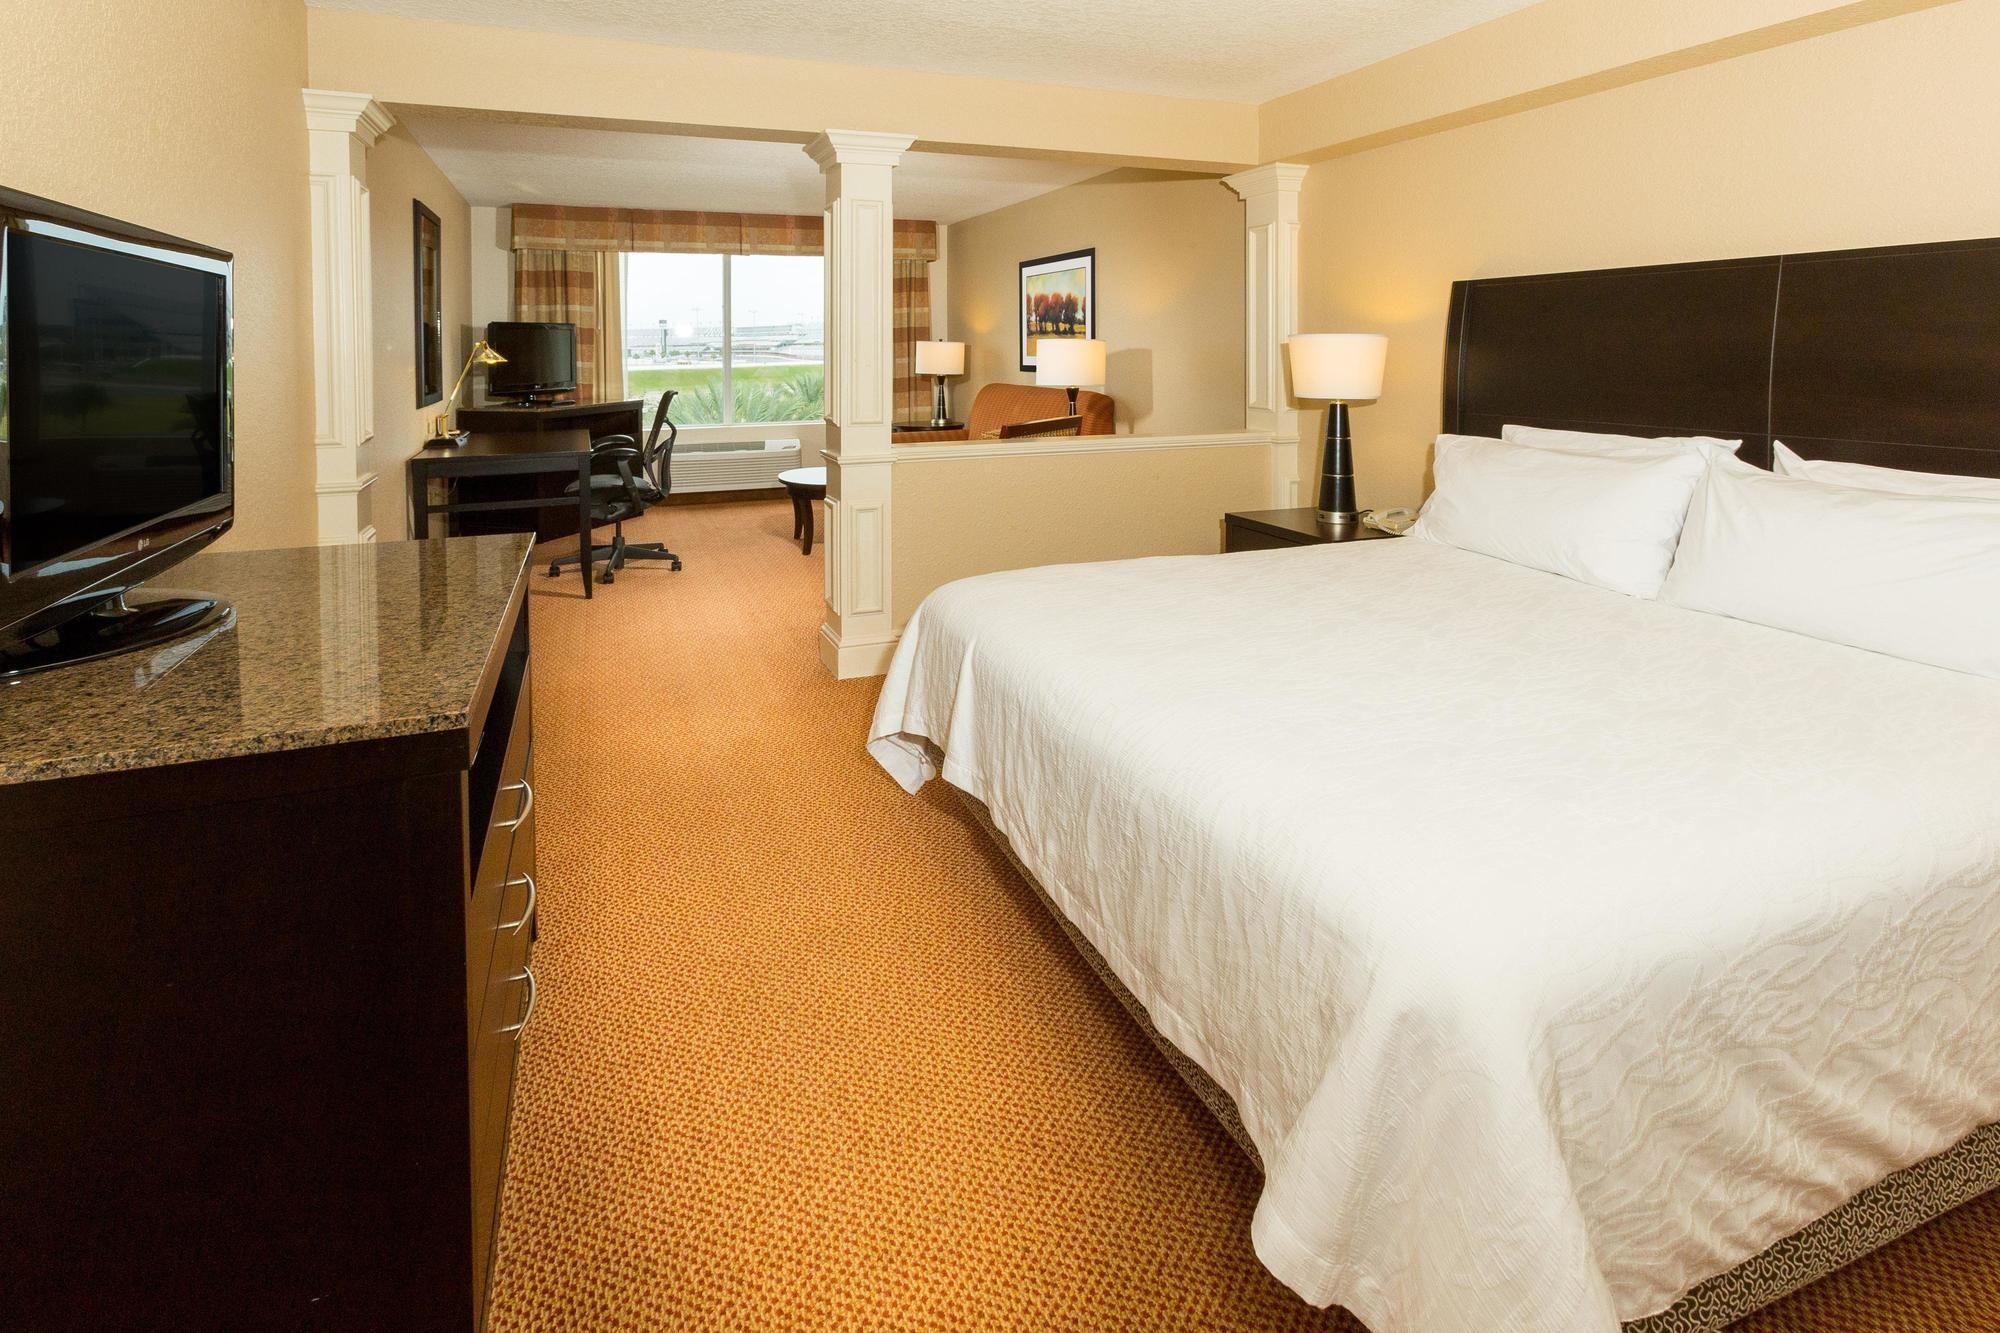 Hilton Garden Inn Daytona Beach Airport. Daytona Beach Hotel Coupons for Daytona Beach  Florida